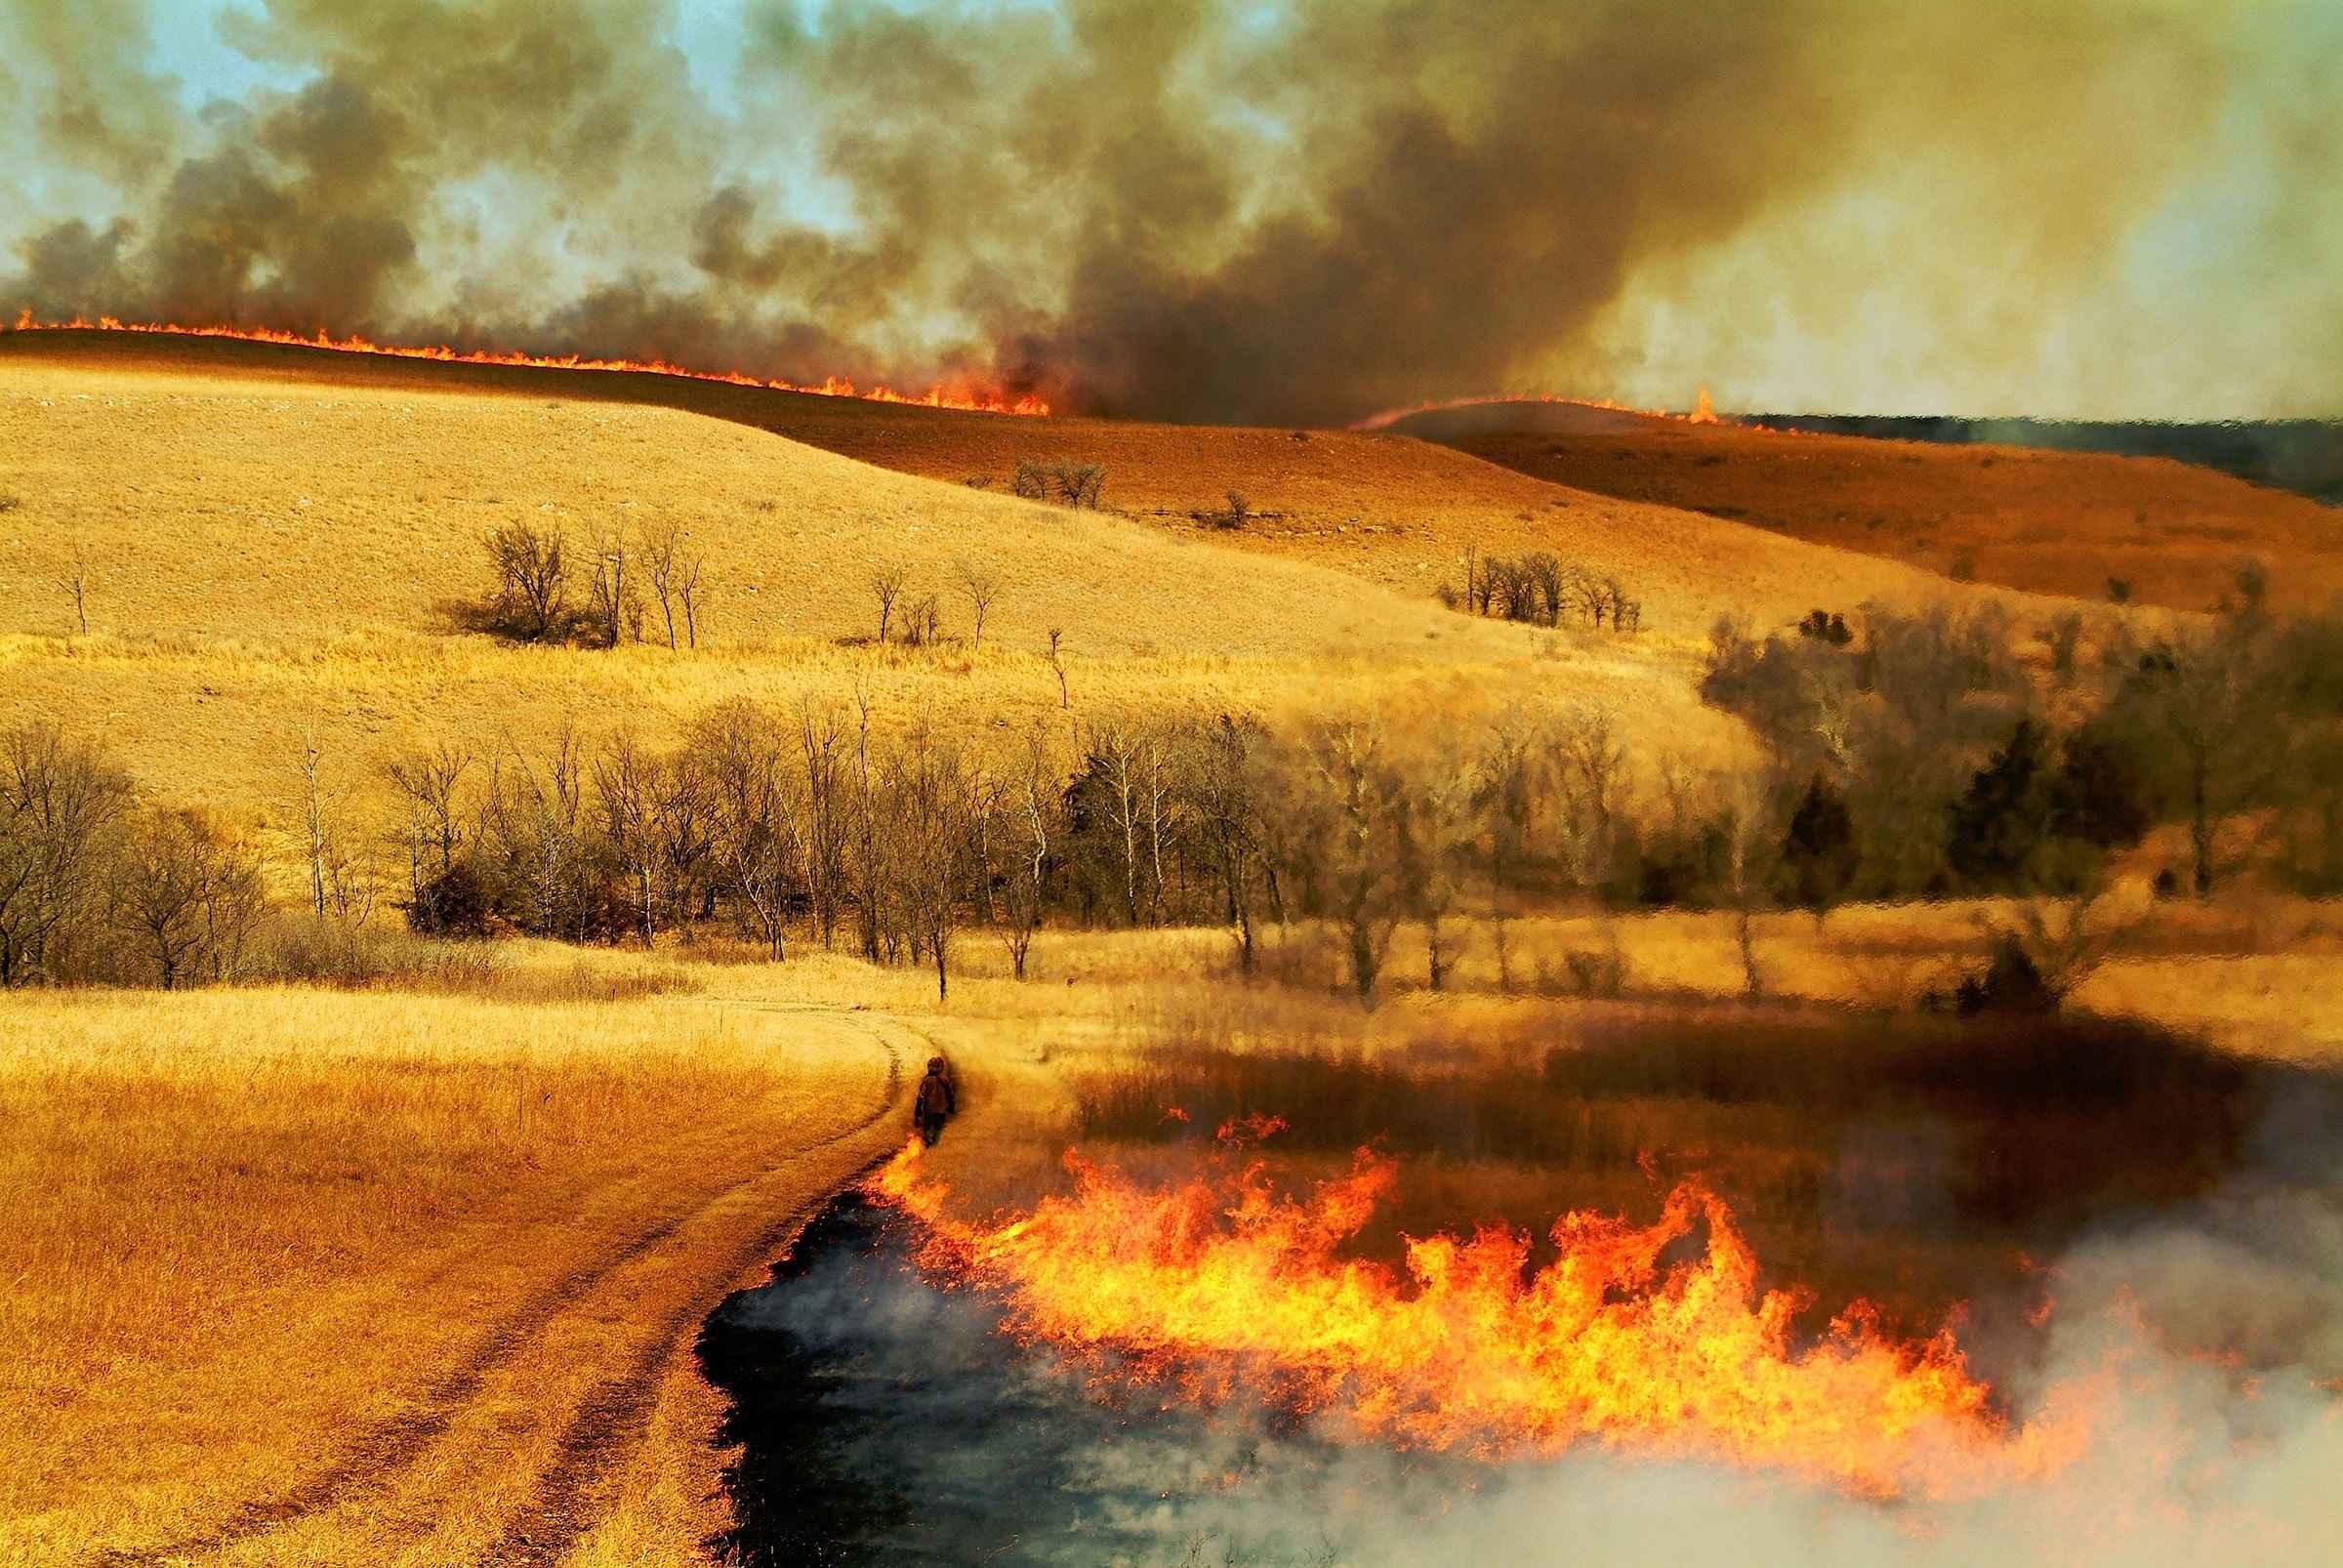 Trail Blazing by  Edward Sturr - Masterpiece Online